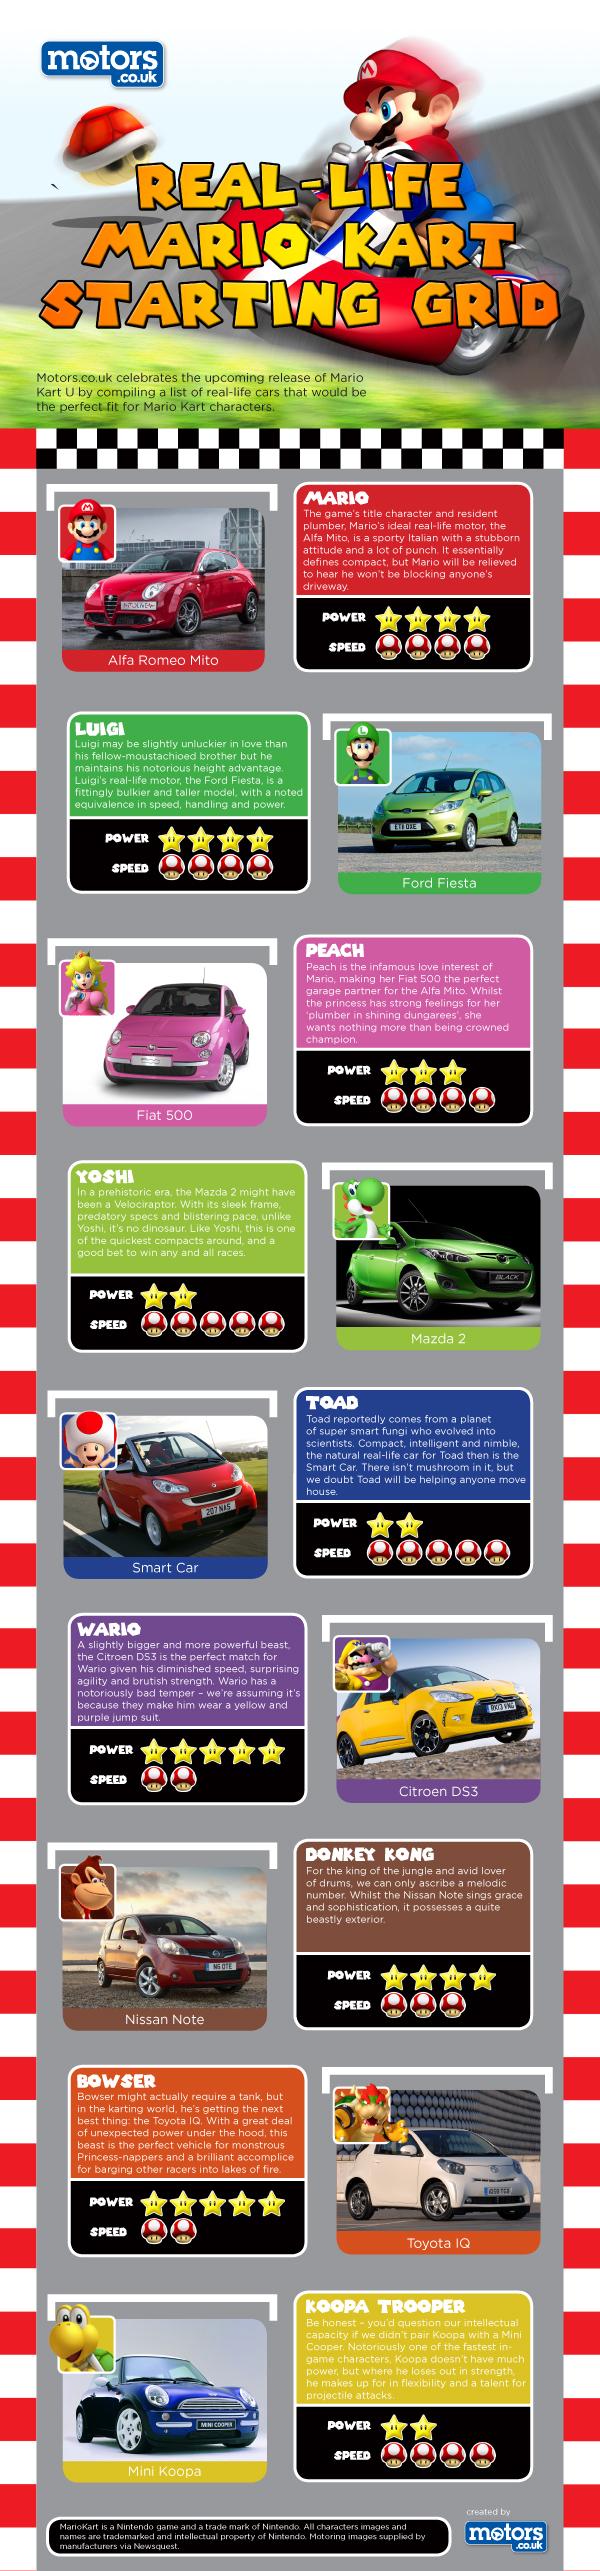 Super-mario-kart-infographic-600px-v2